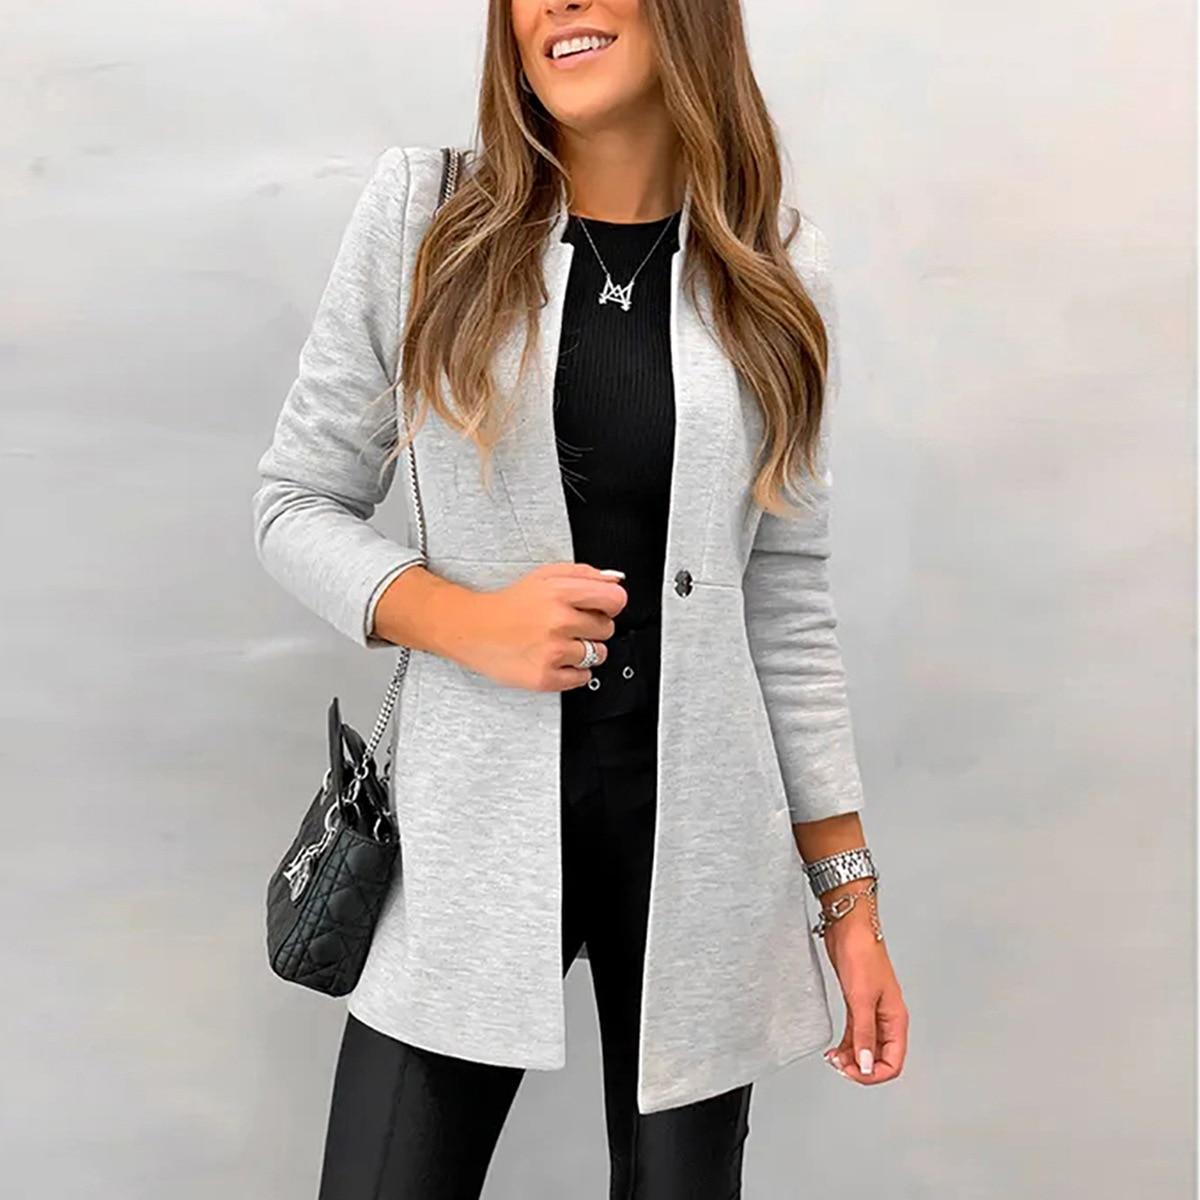 Elegant Women Blazer Suits 2020 New Autumn Winter Notched Collar Long Sleeve Slim Suit Jacket Office Ladies Black Gray Suit Coat